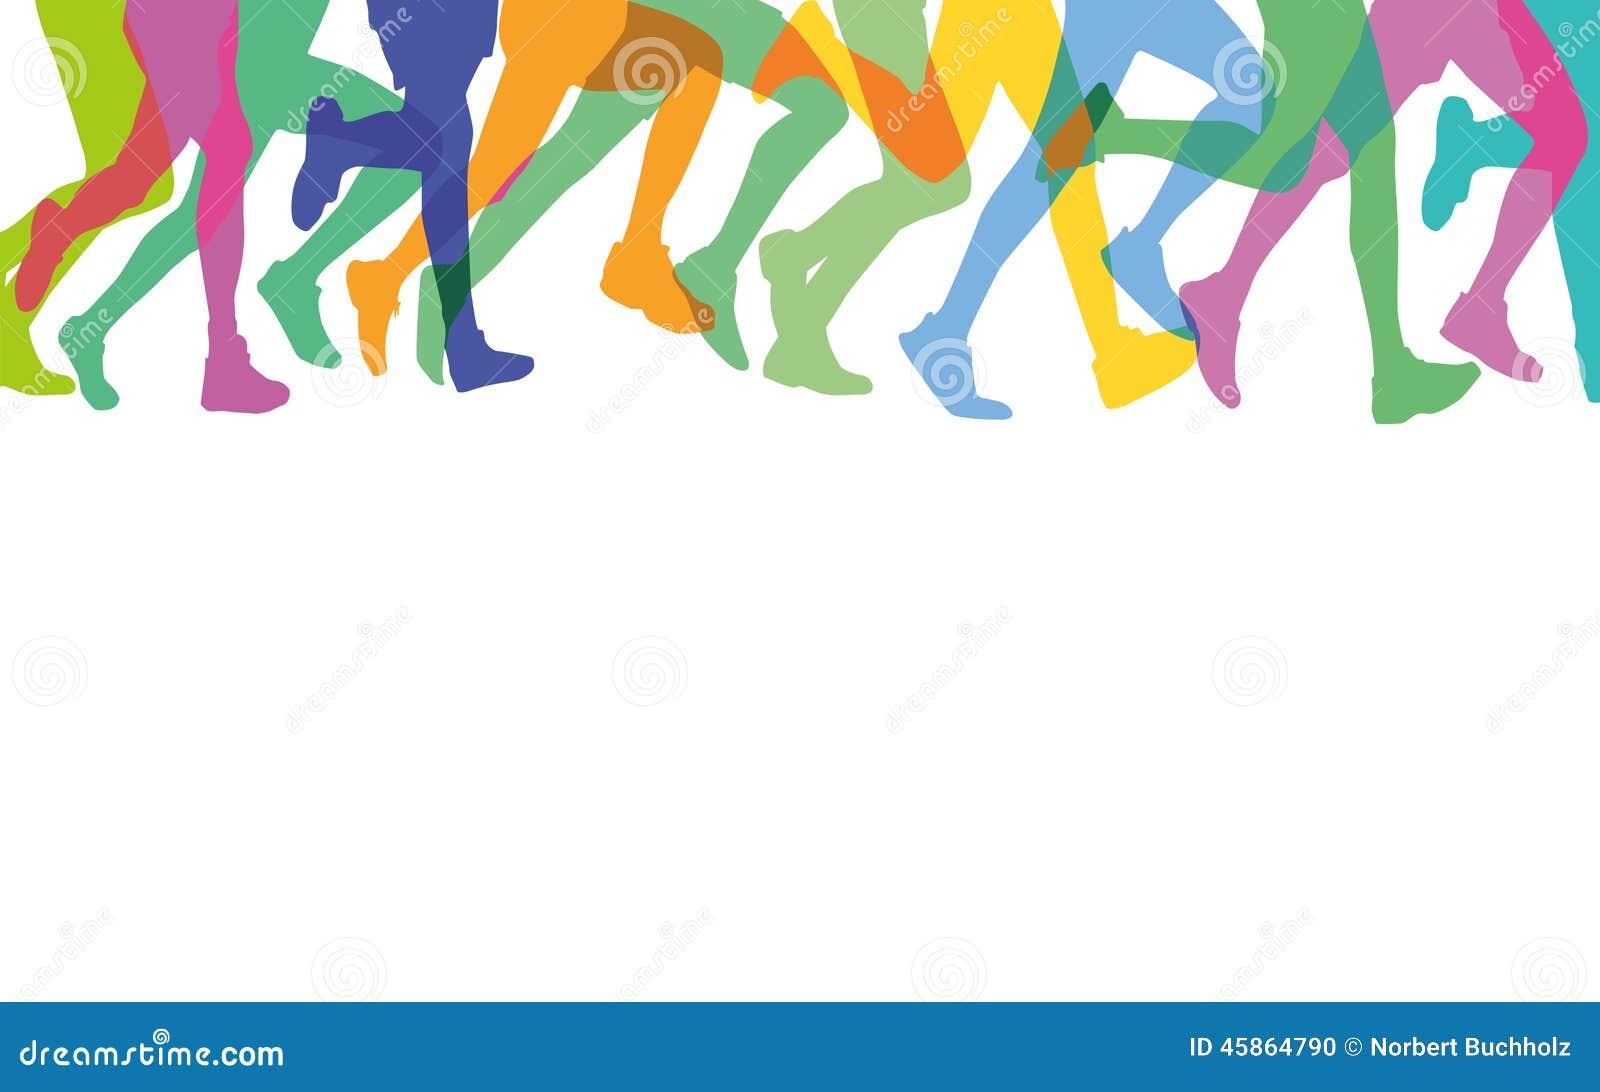 legs of runners stock vector illustration of marathon clip art of running deer clip art of running egg